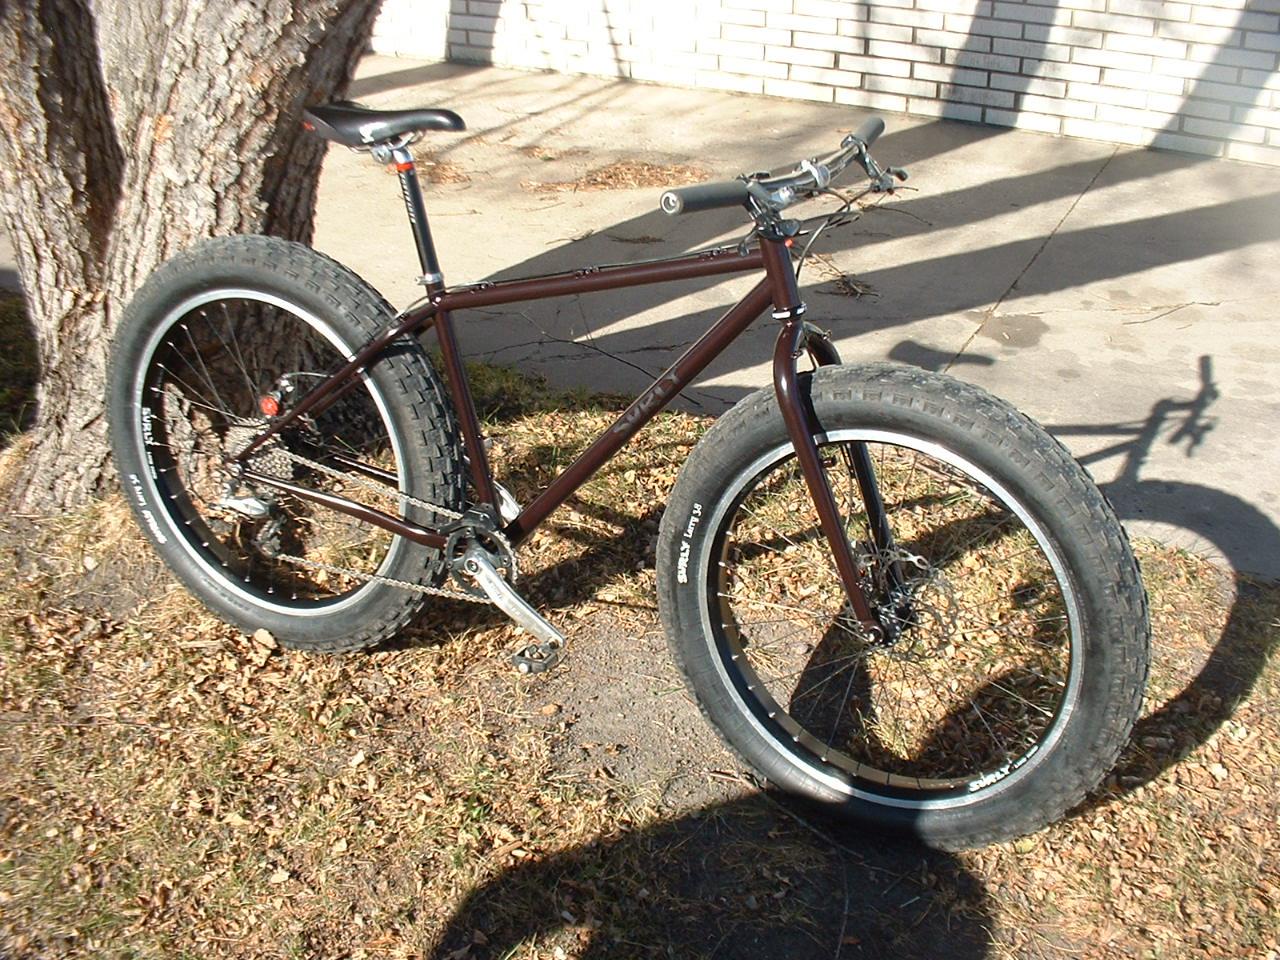 Daily fatbike pic thread-dscf0520.jpg